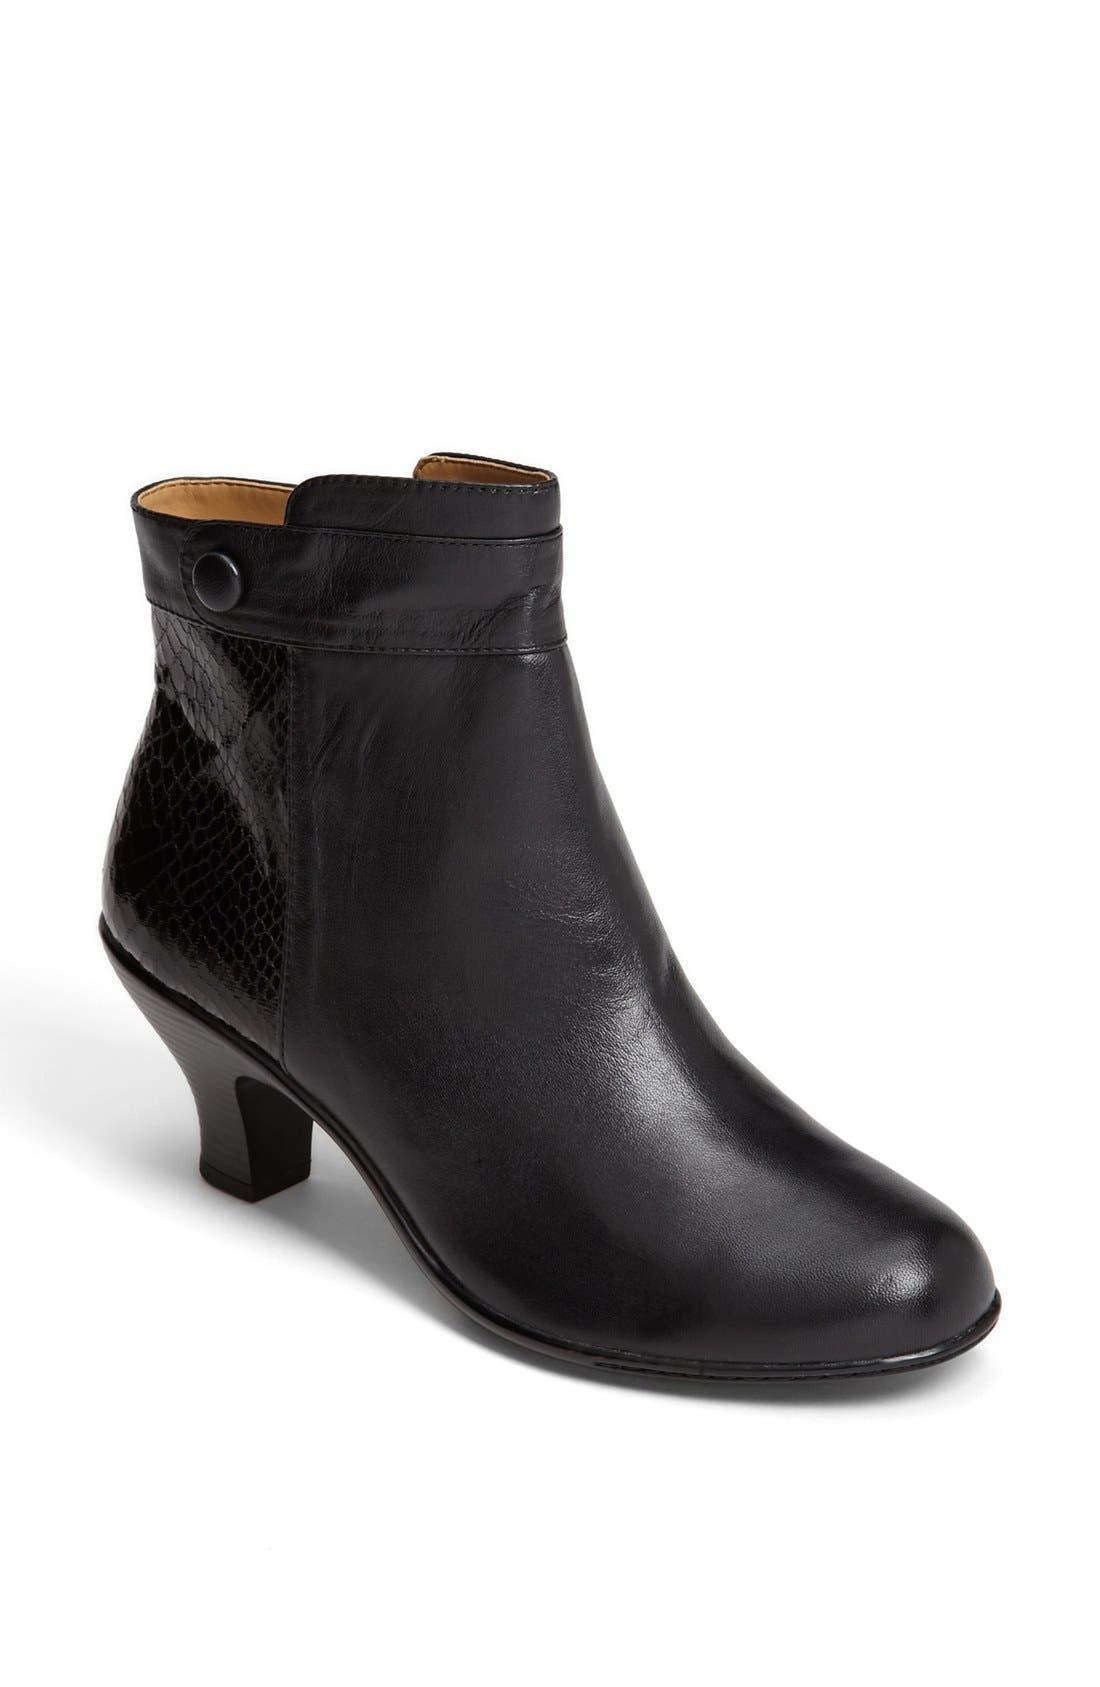 Main Image - Softspots 'Sherry' Boot